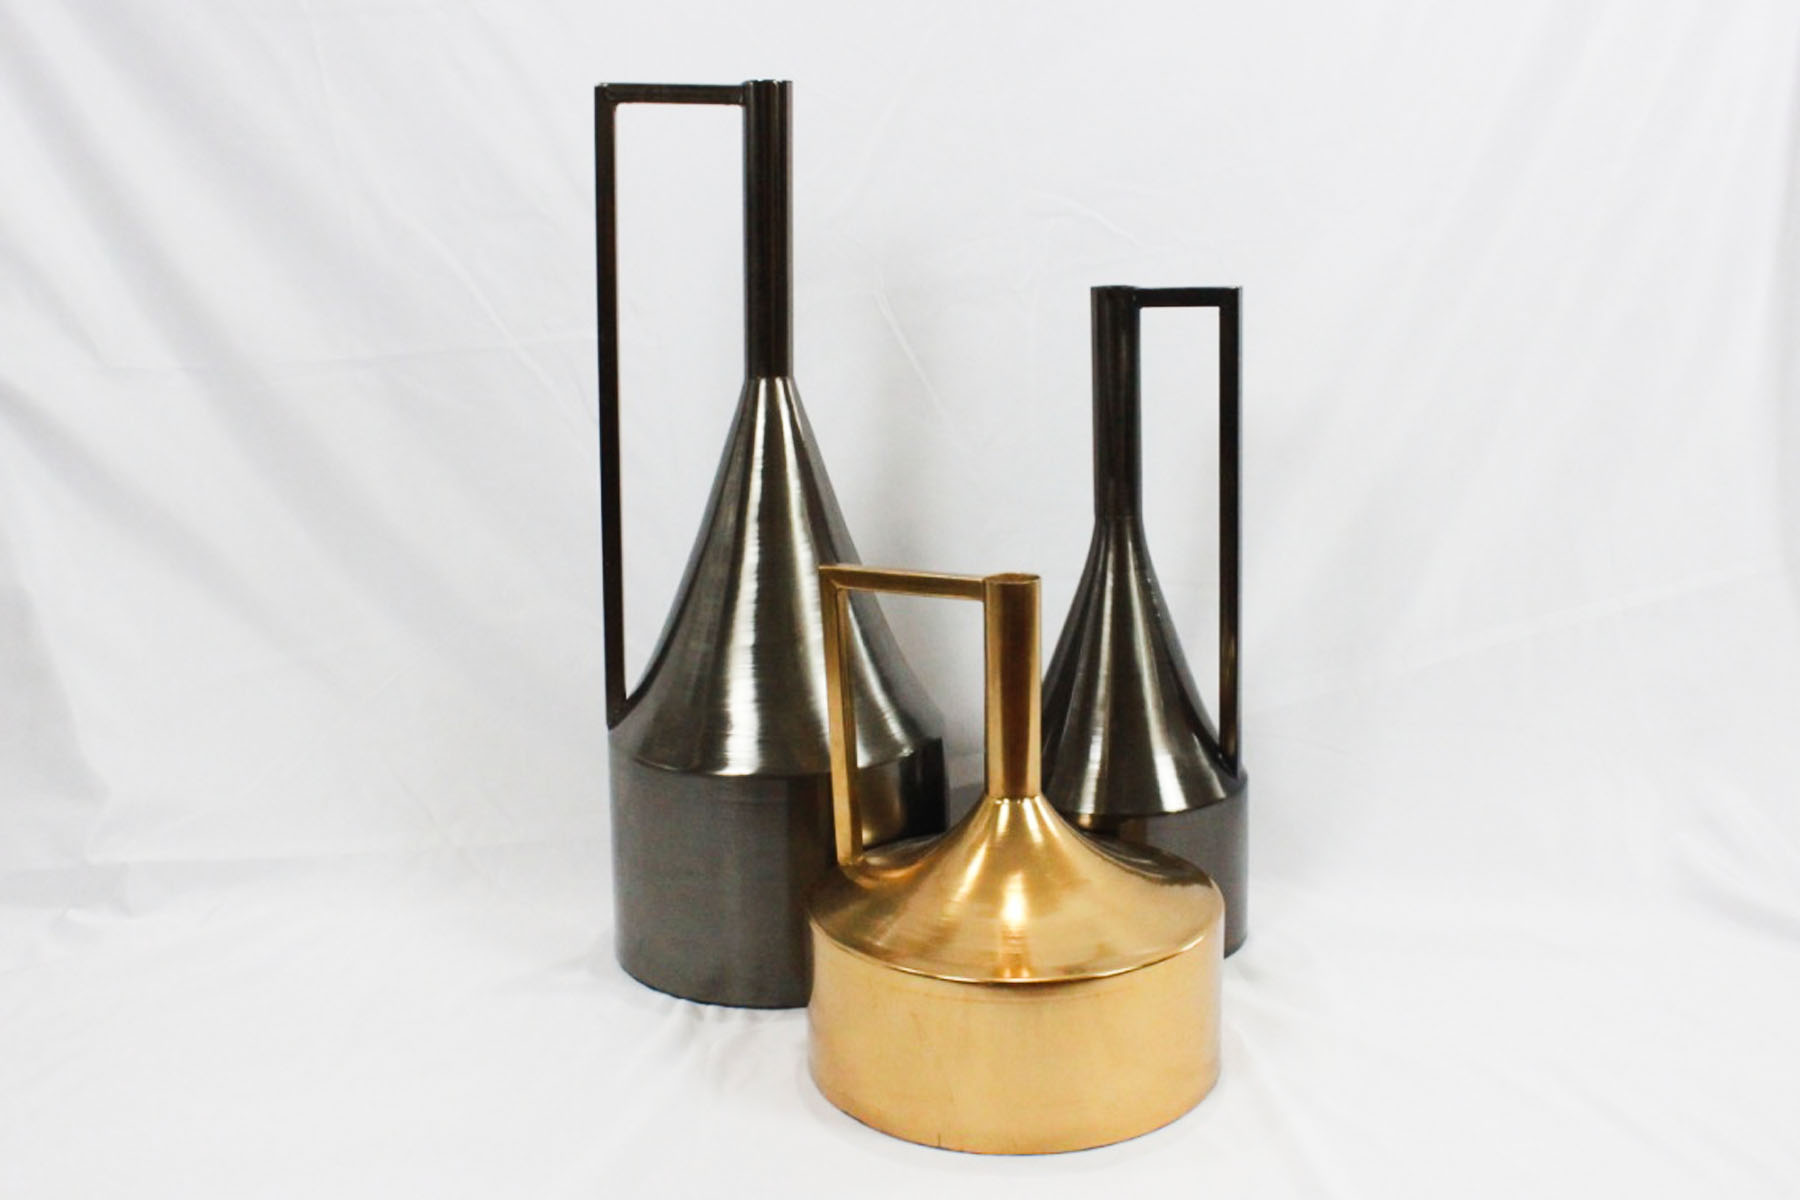 Zenon Metal Vases - Scavenged Vintage Rentals